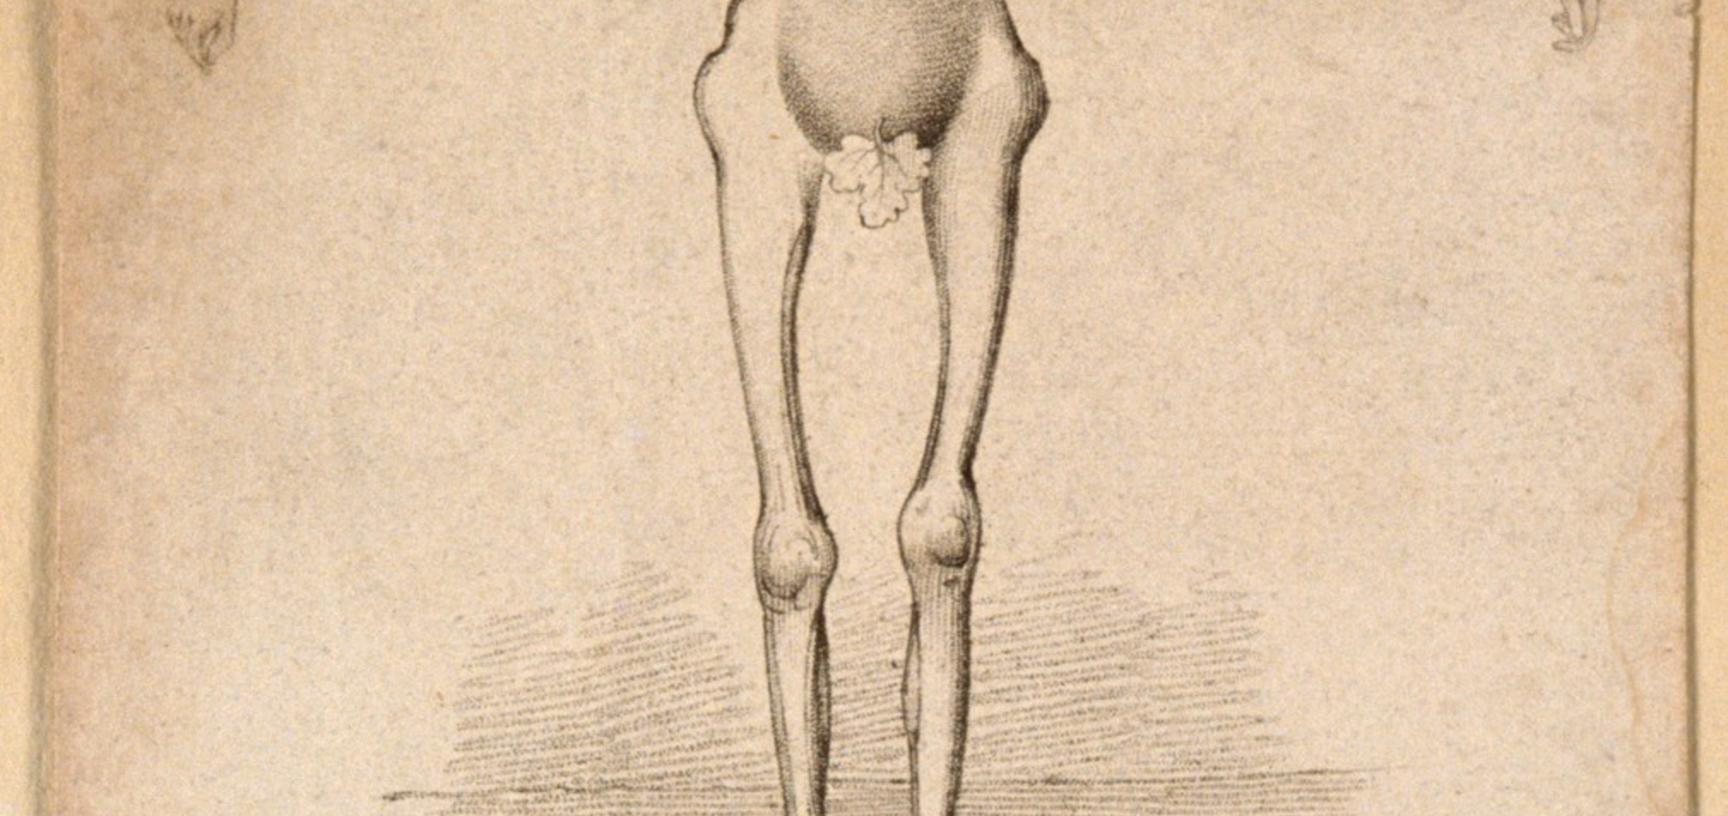 Claude Ambroise Seurat, known as the 'Human skeleton'.